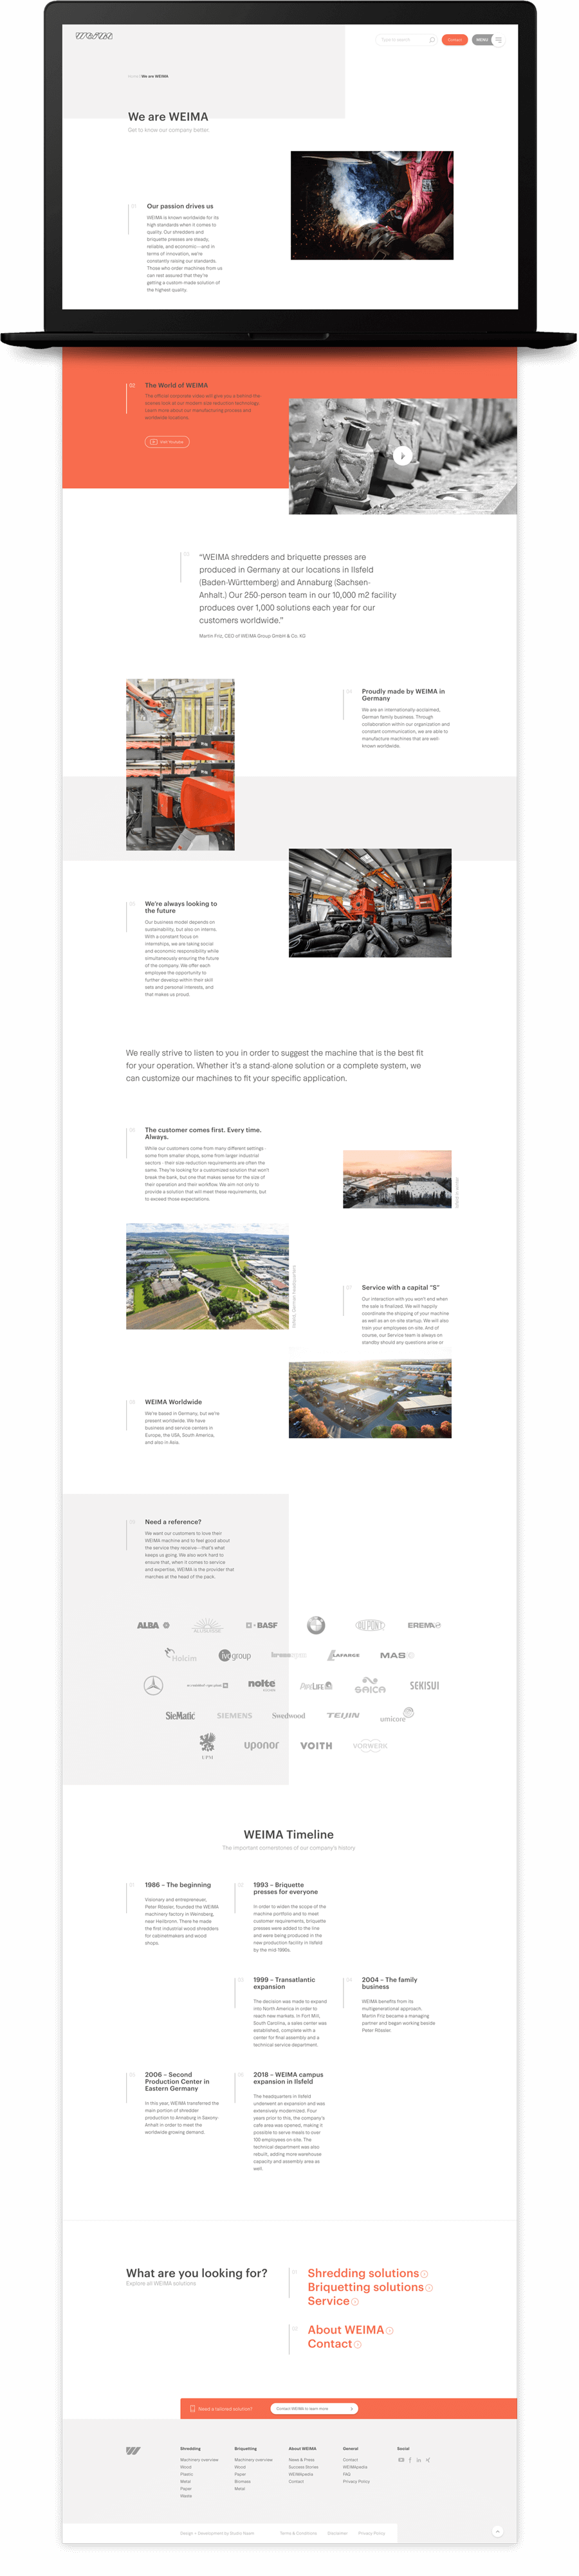 De Weima Maschinenbau over ons pagina.